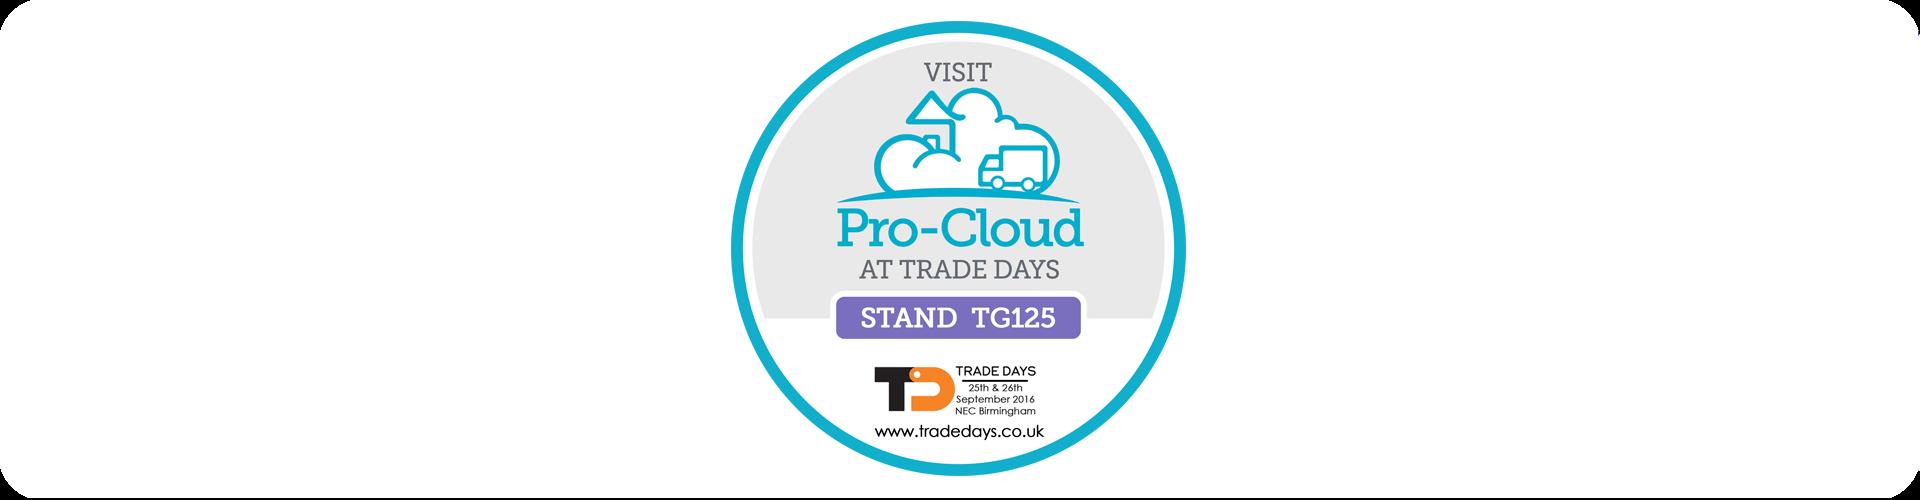 pro-cloud at trade days stamp